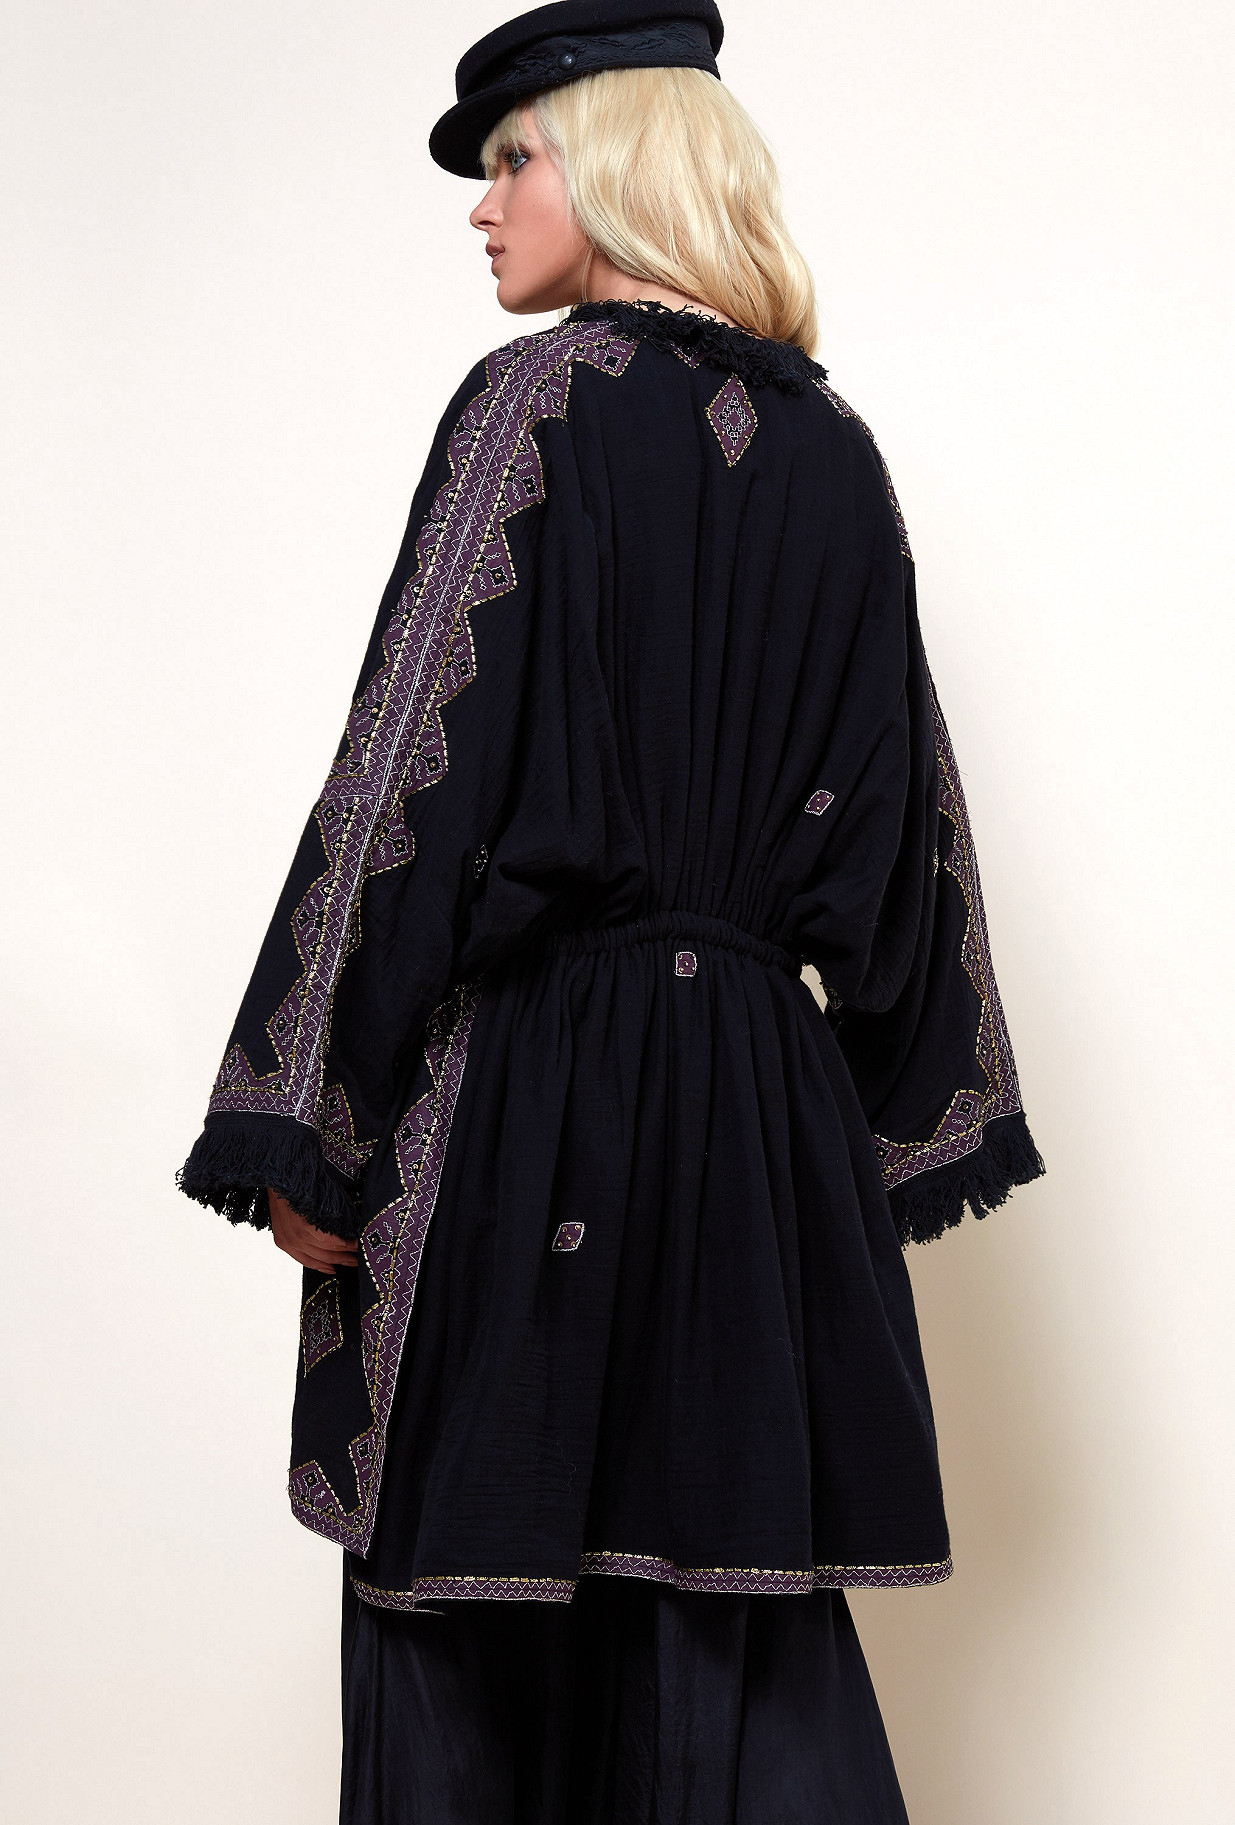 Paris clothes store COAT  Zabina french designer fashion Paris